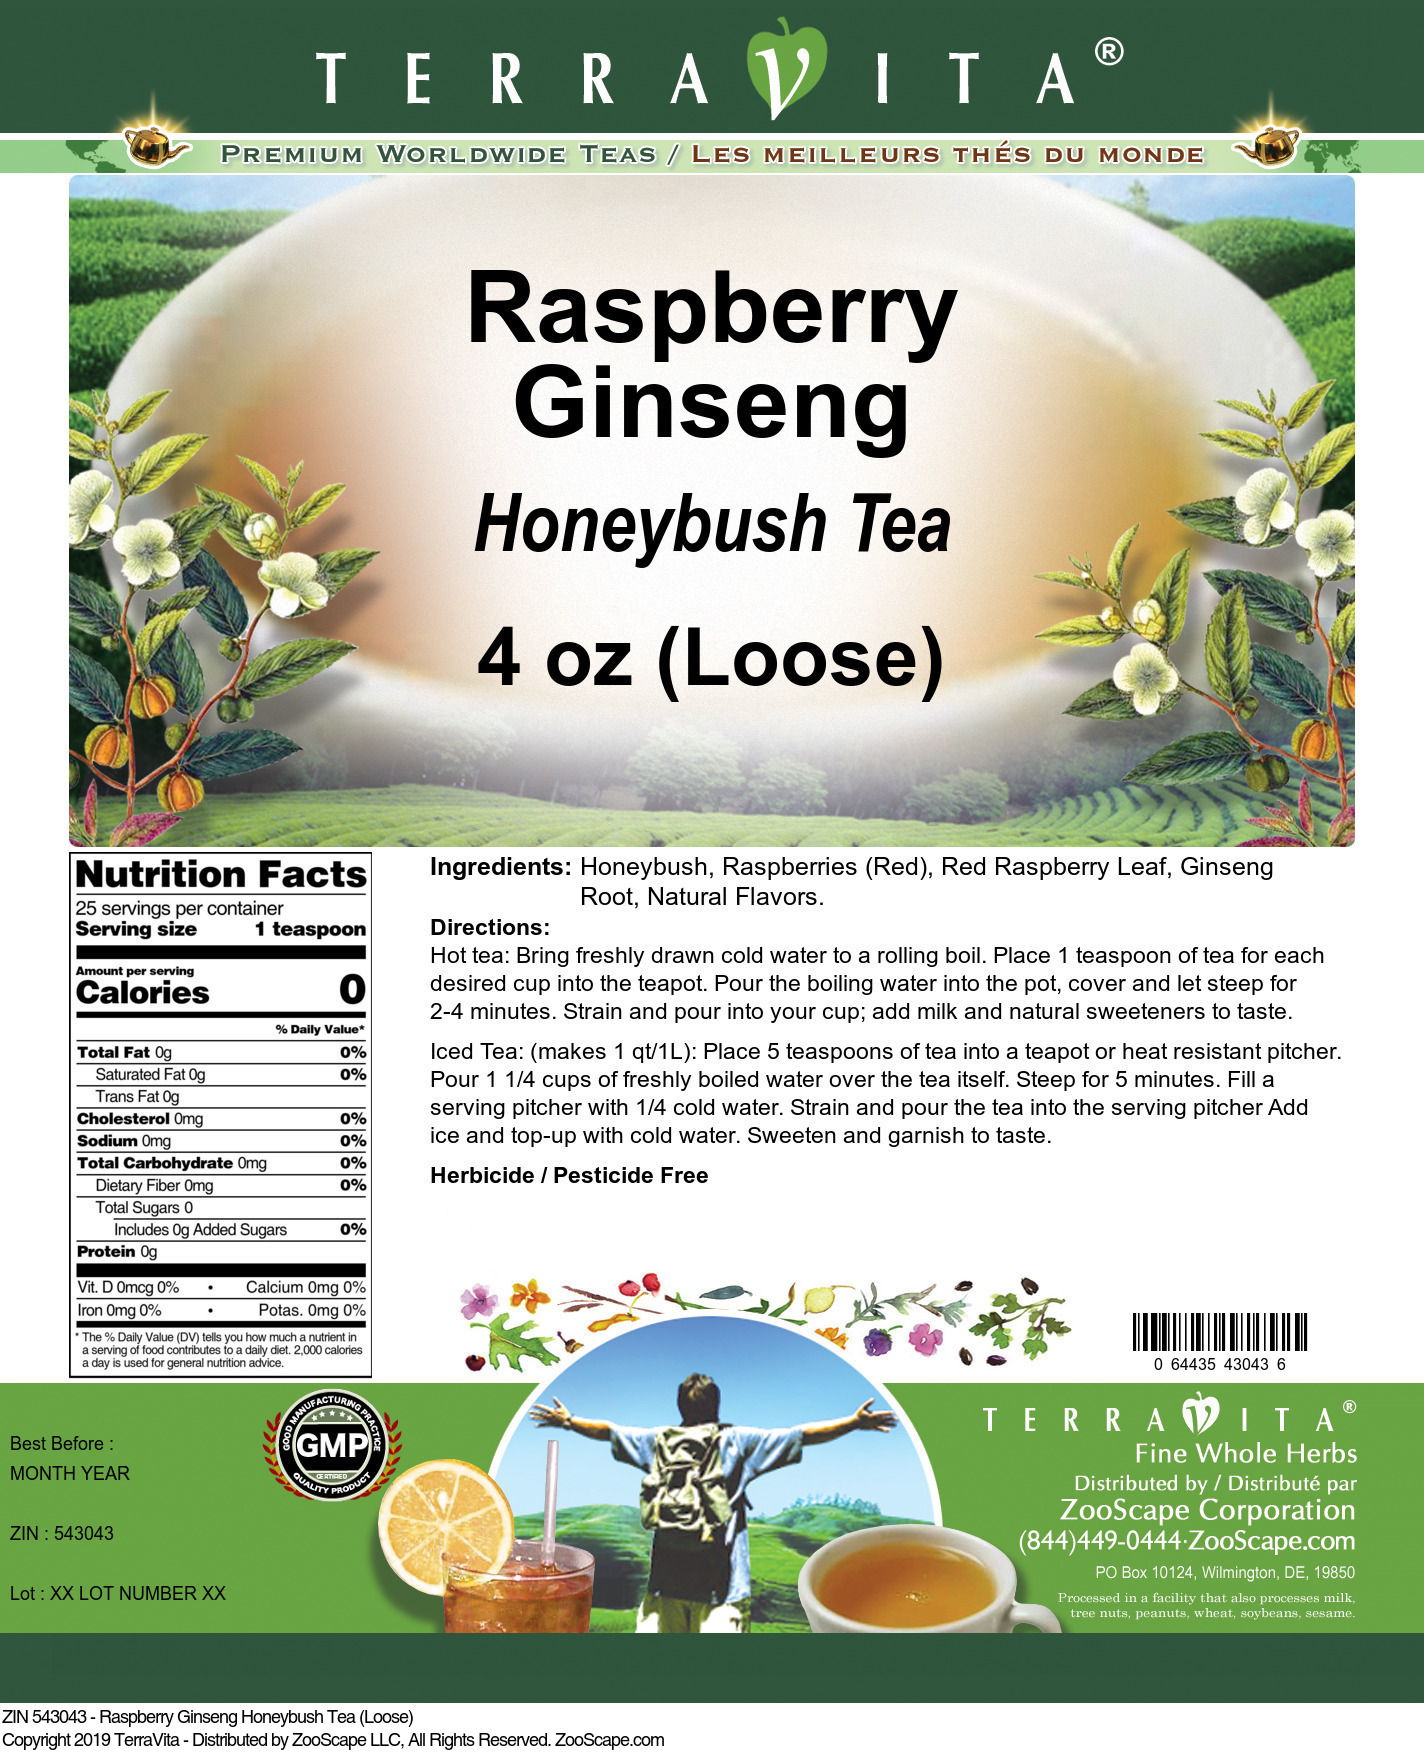 Raspberry Ginseng Honeybush Tea (Loose)